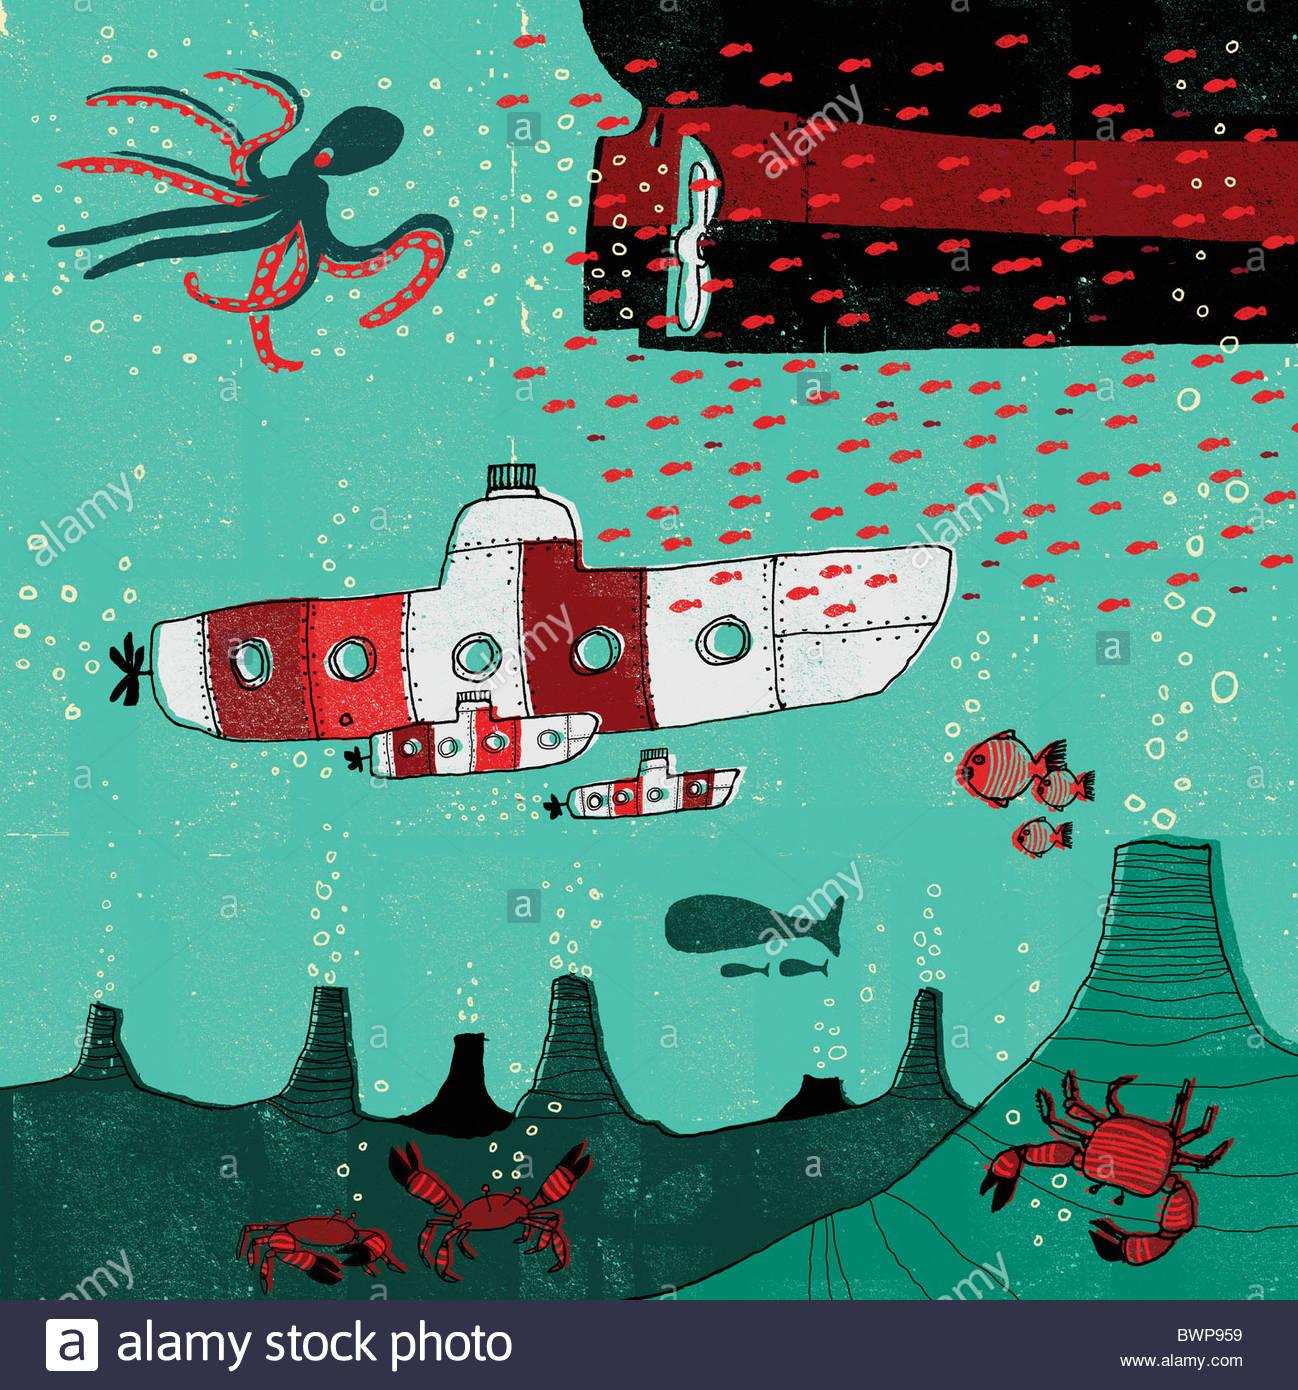 I sommergibili viaggiando sott'acqua in ocean Foto Stock